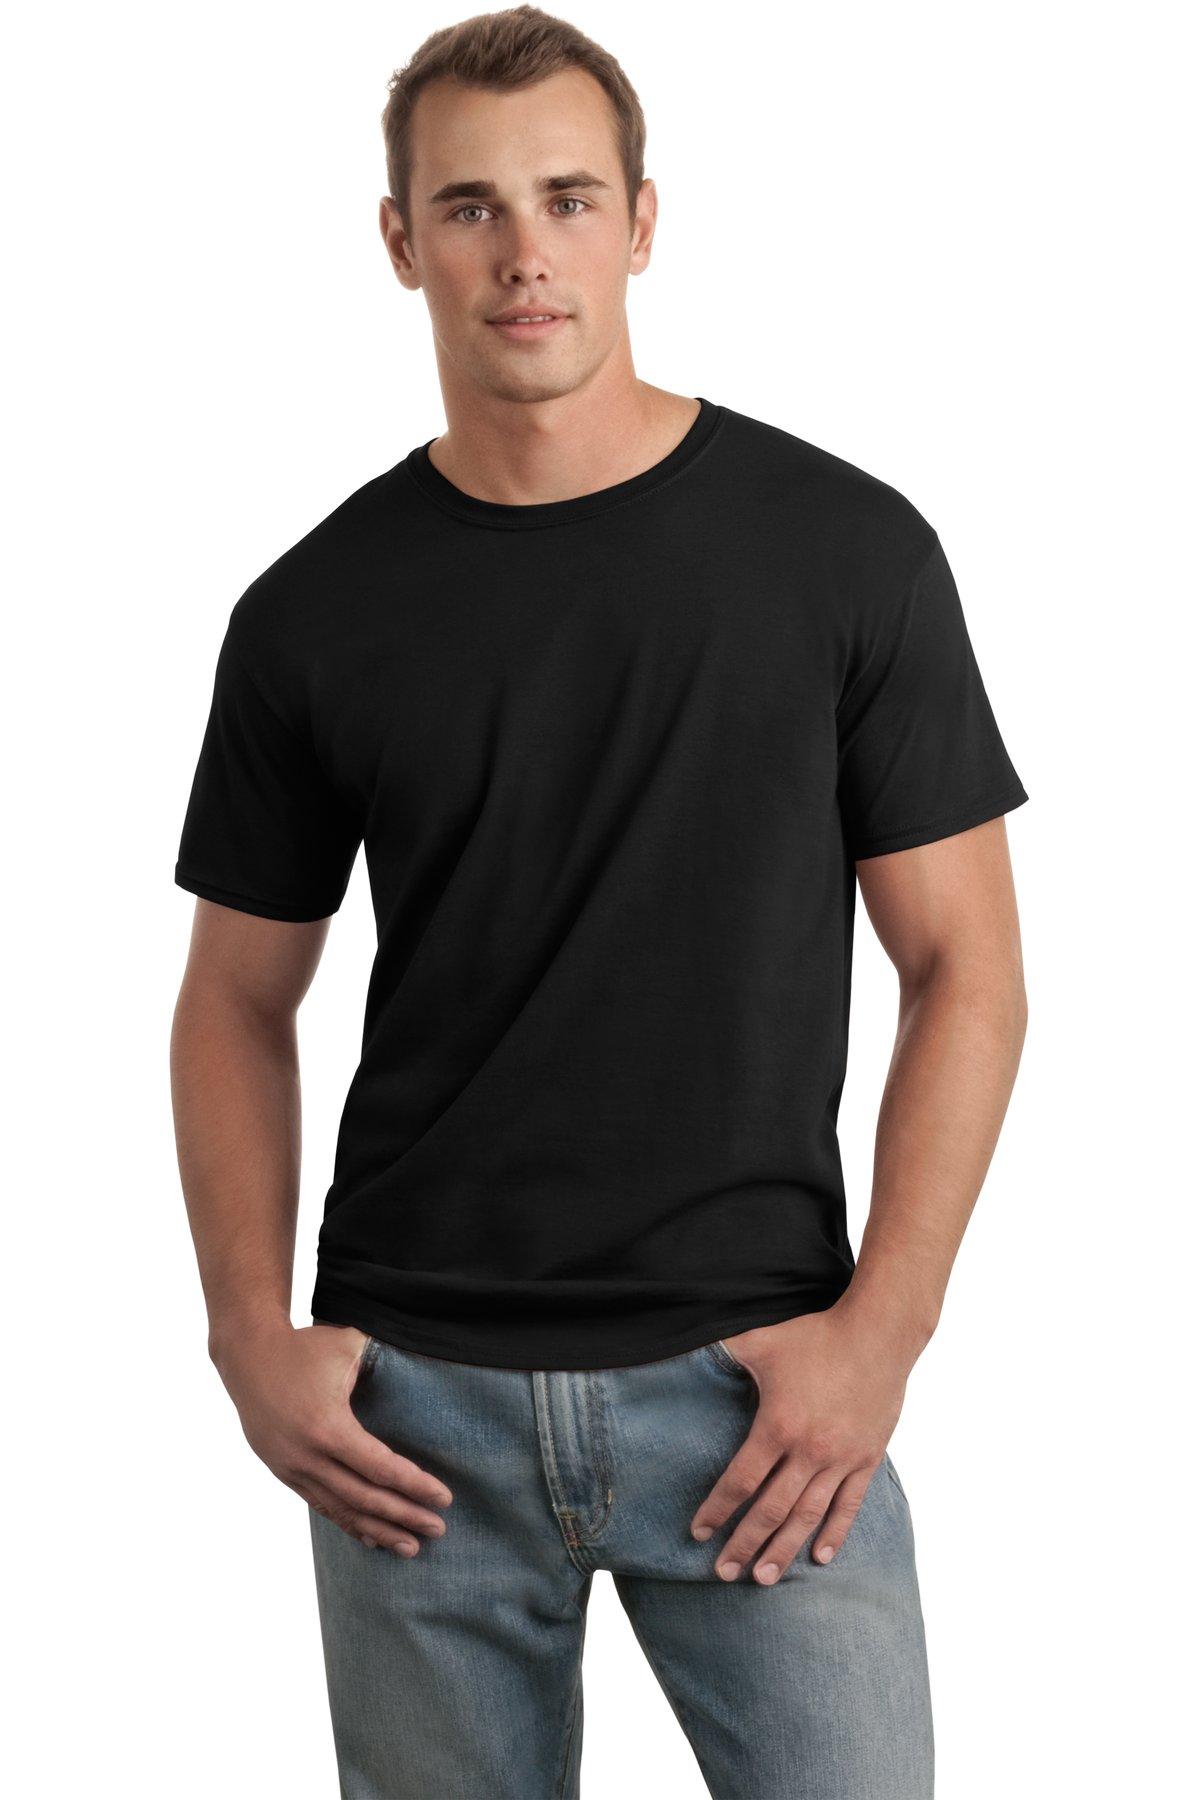 Gildan Softstyle® T-Shirt.-Promotional